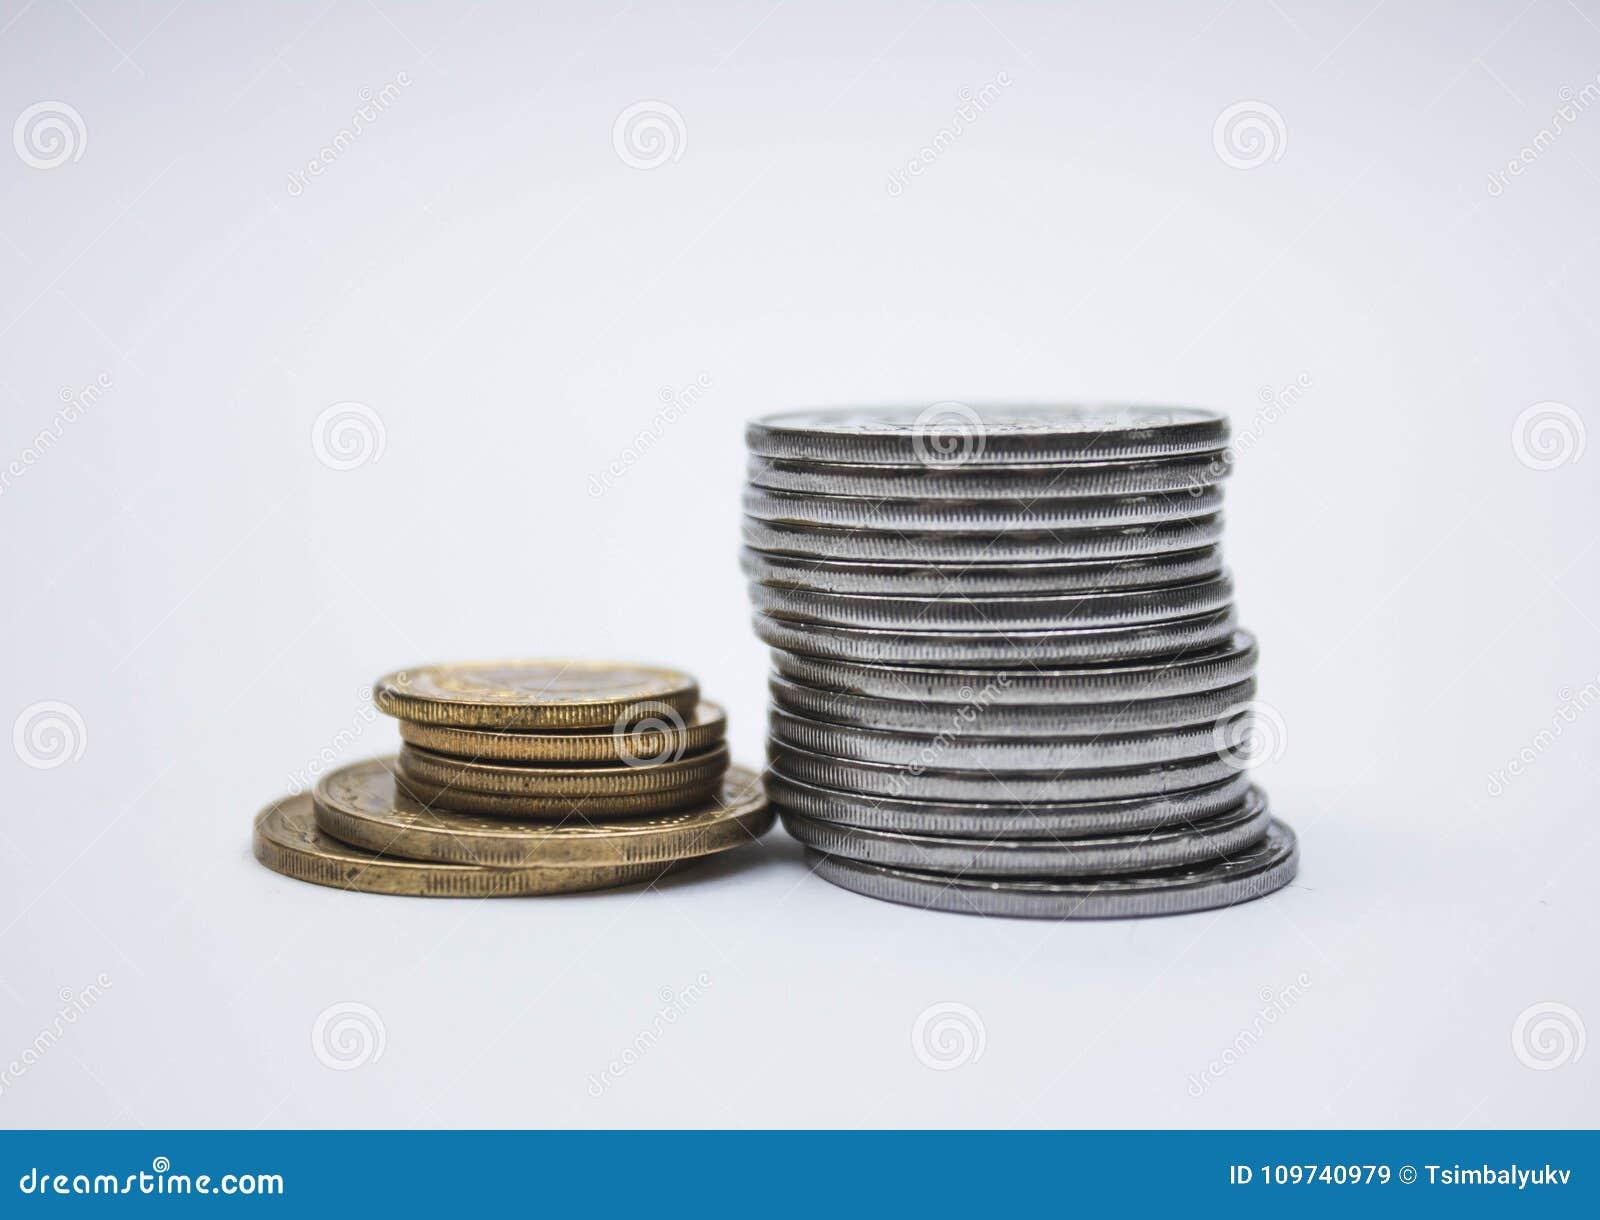 Monet sterty na białym tle, stos monety rozsypisko monety srebra złoto, miedziana tajlandzka moneta